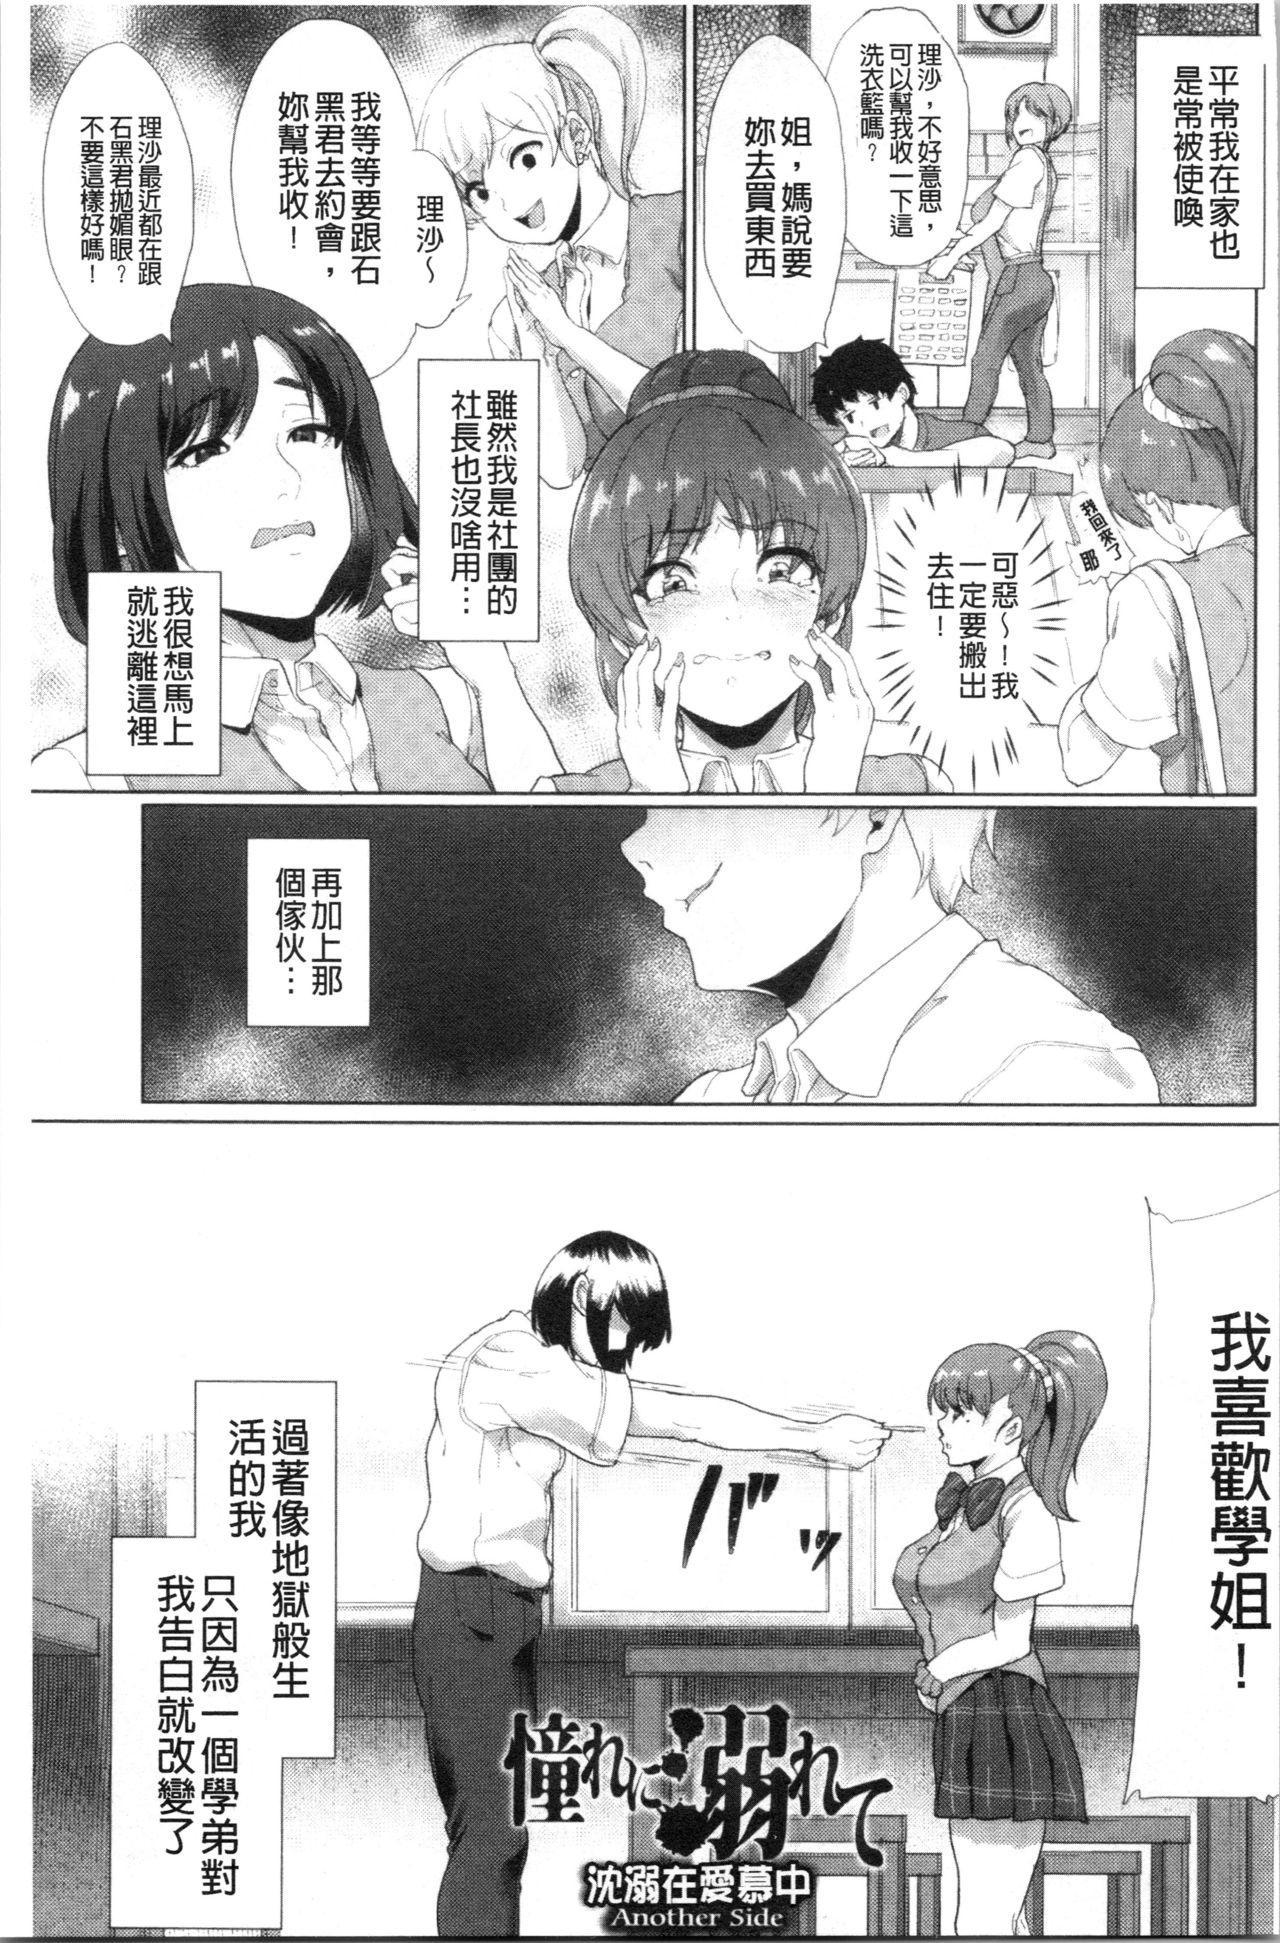 Kanojo ga SEX ni nare teru wake | 女友對激情性愛變很習慣的理由 65